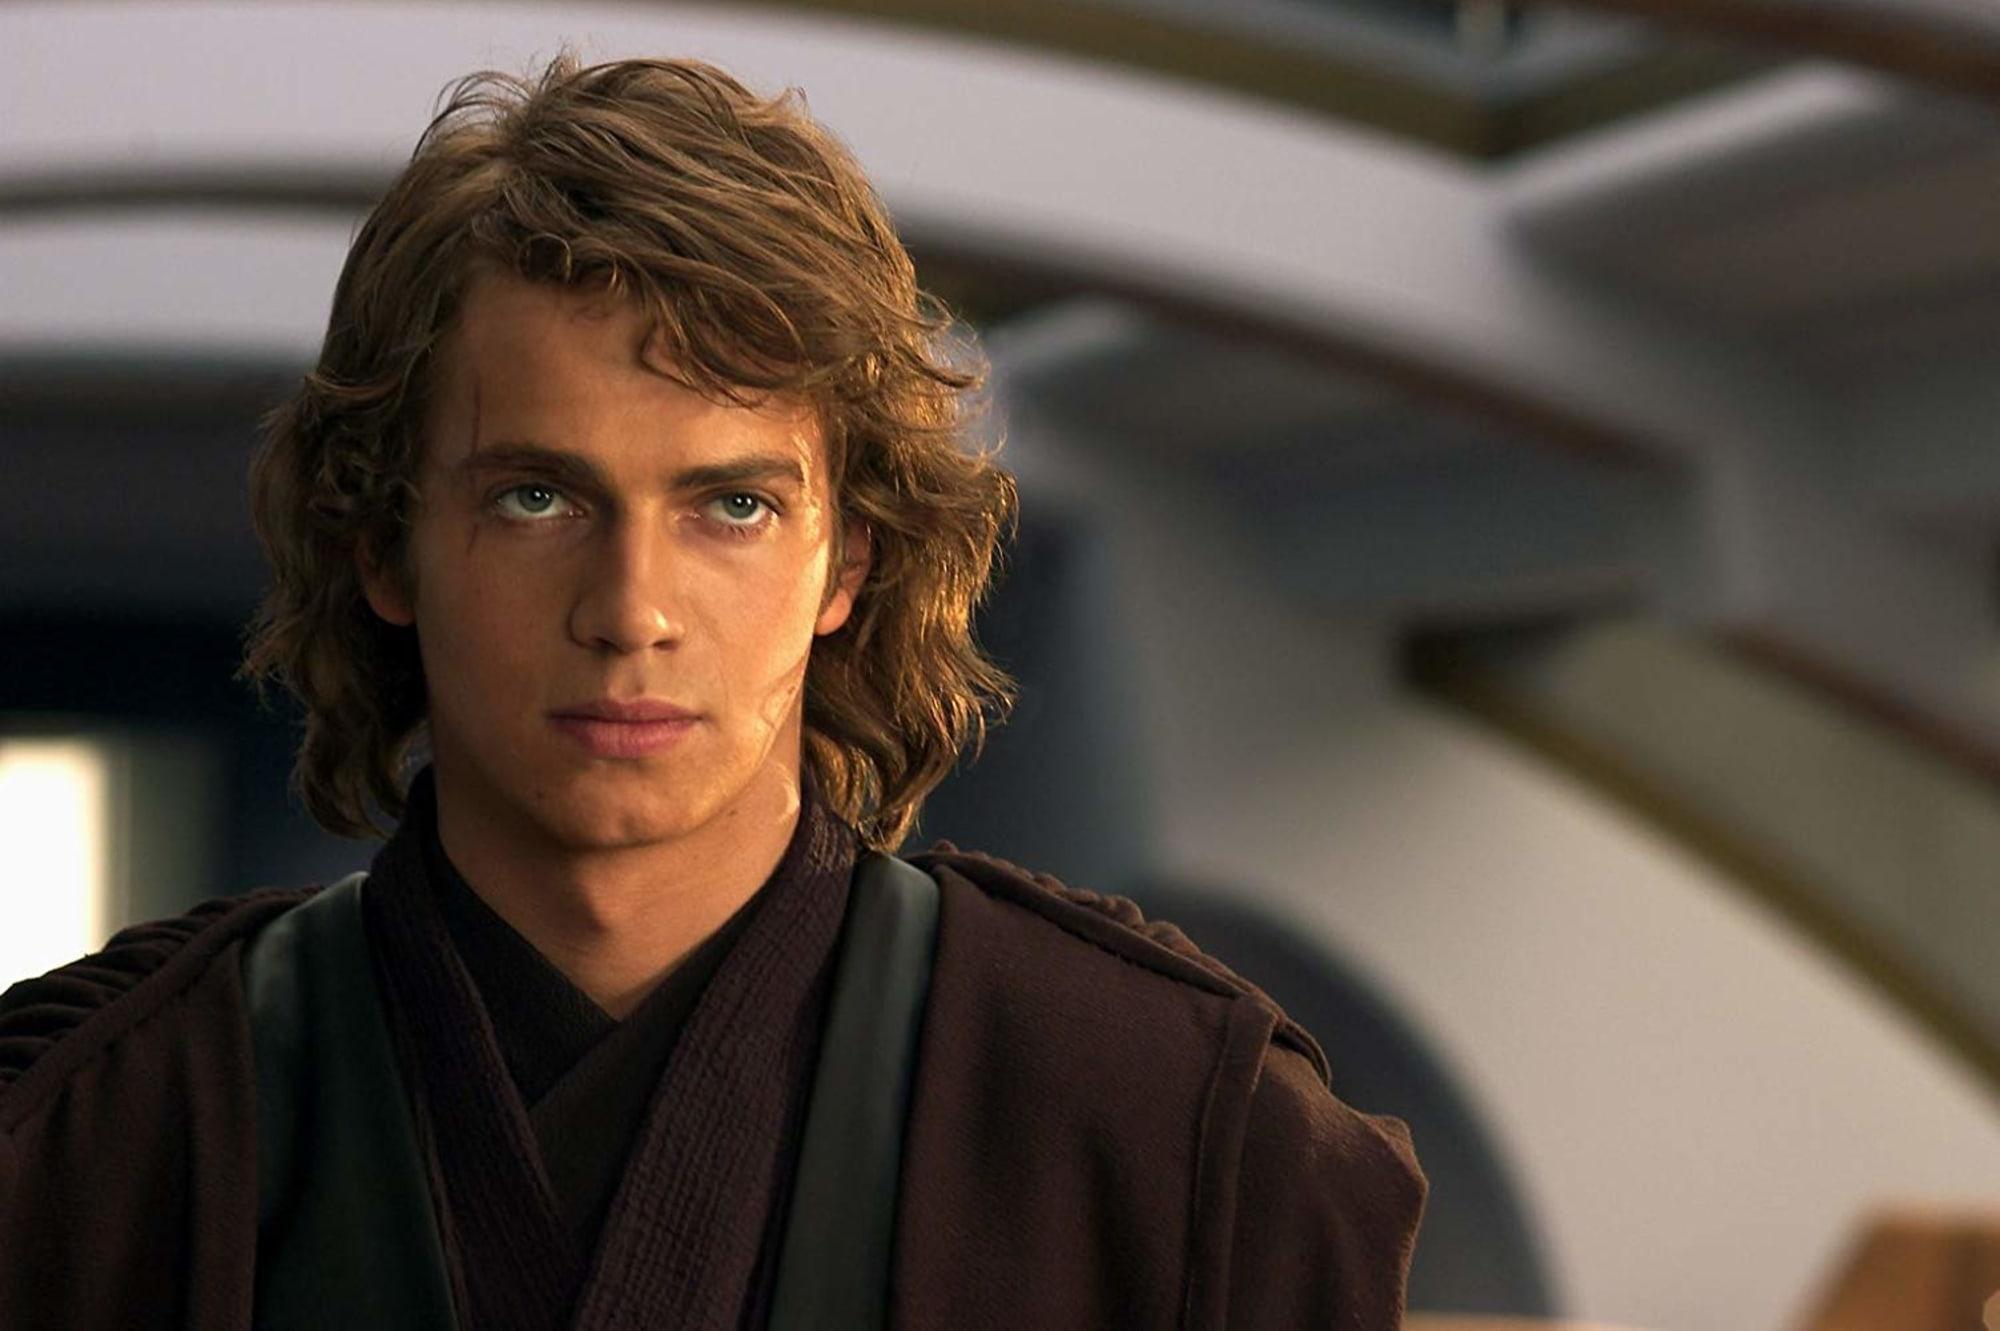 Is Anakin In Star Wars Episode 9 The Rise Of Skywalker